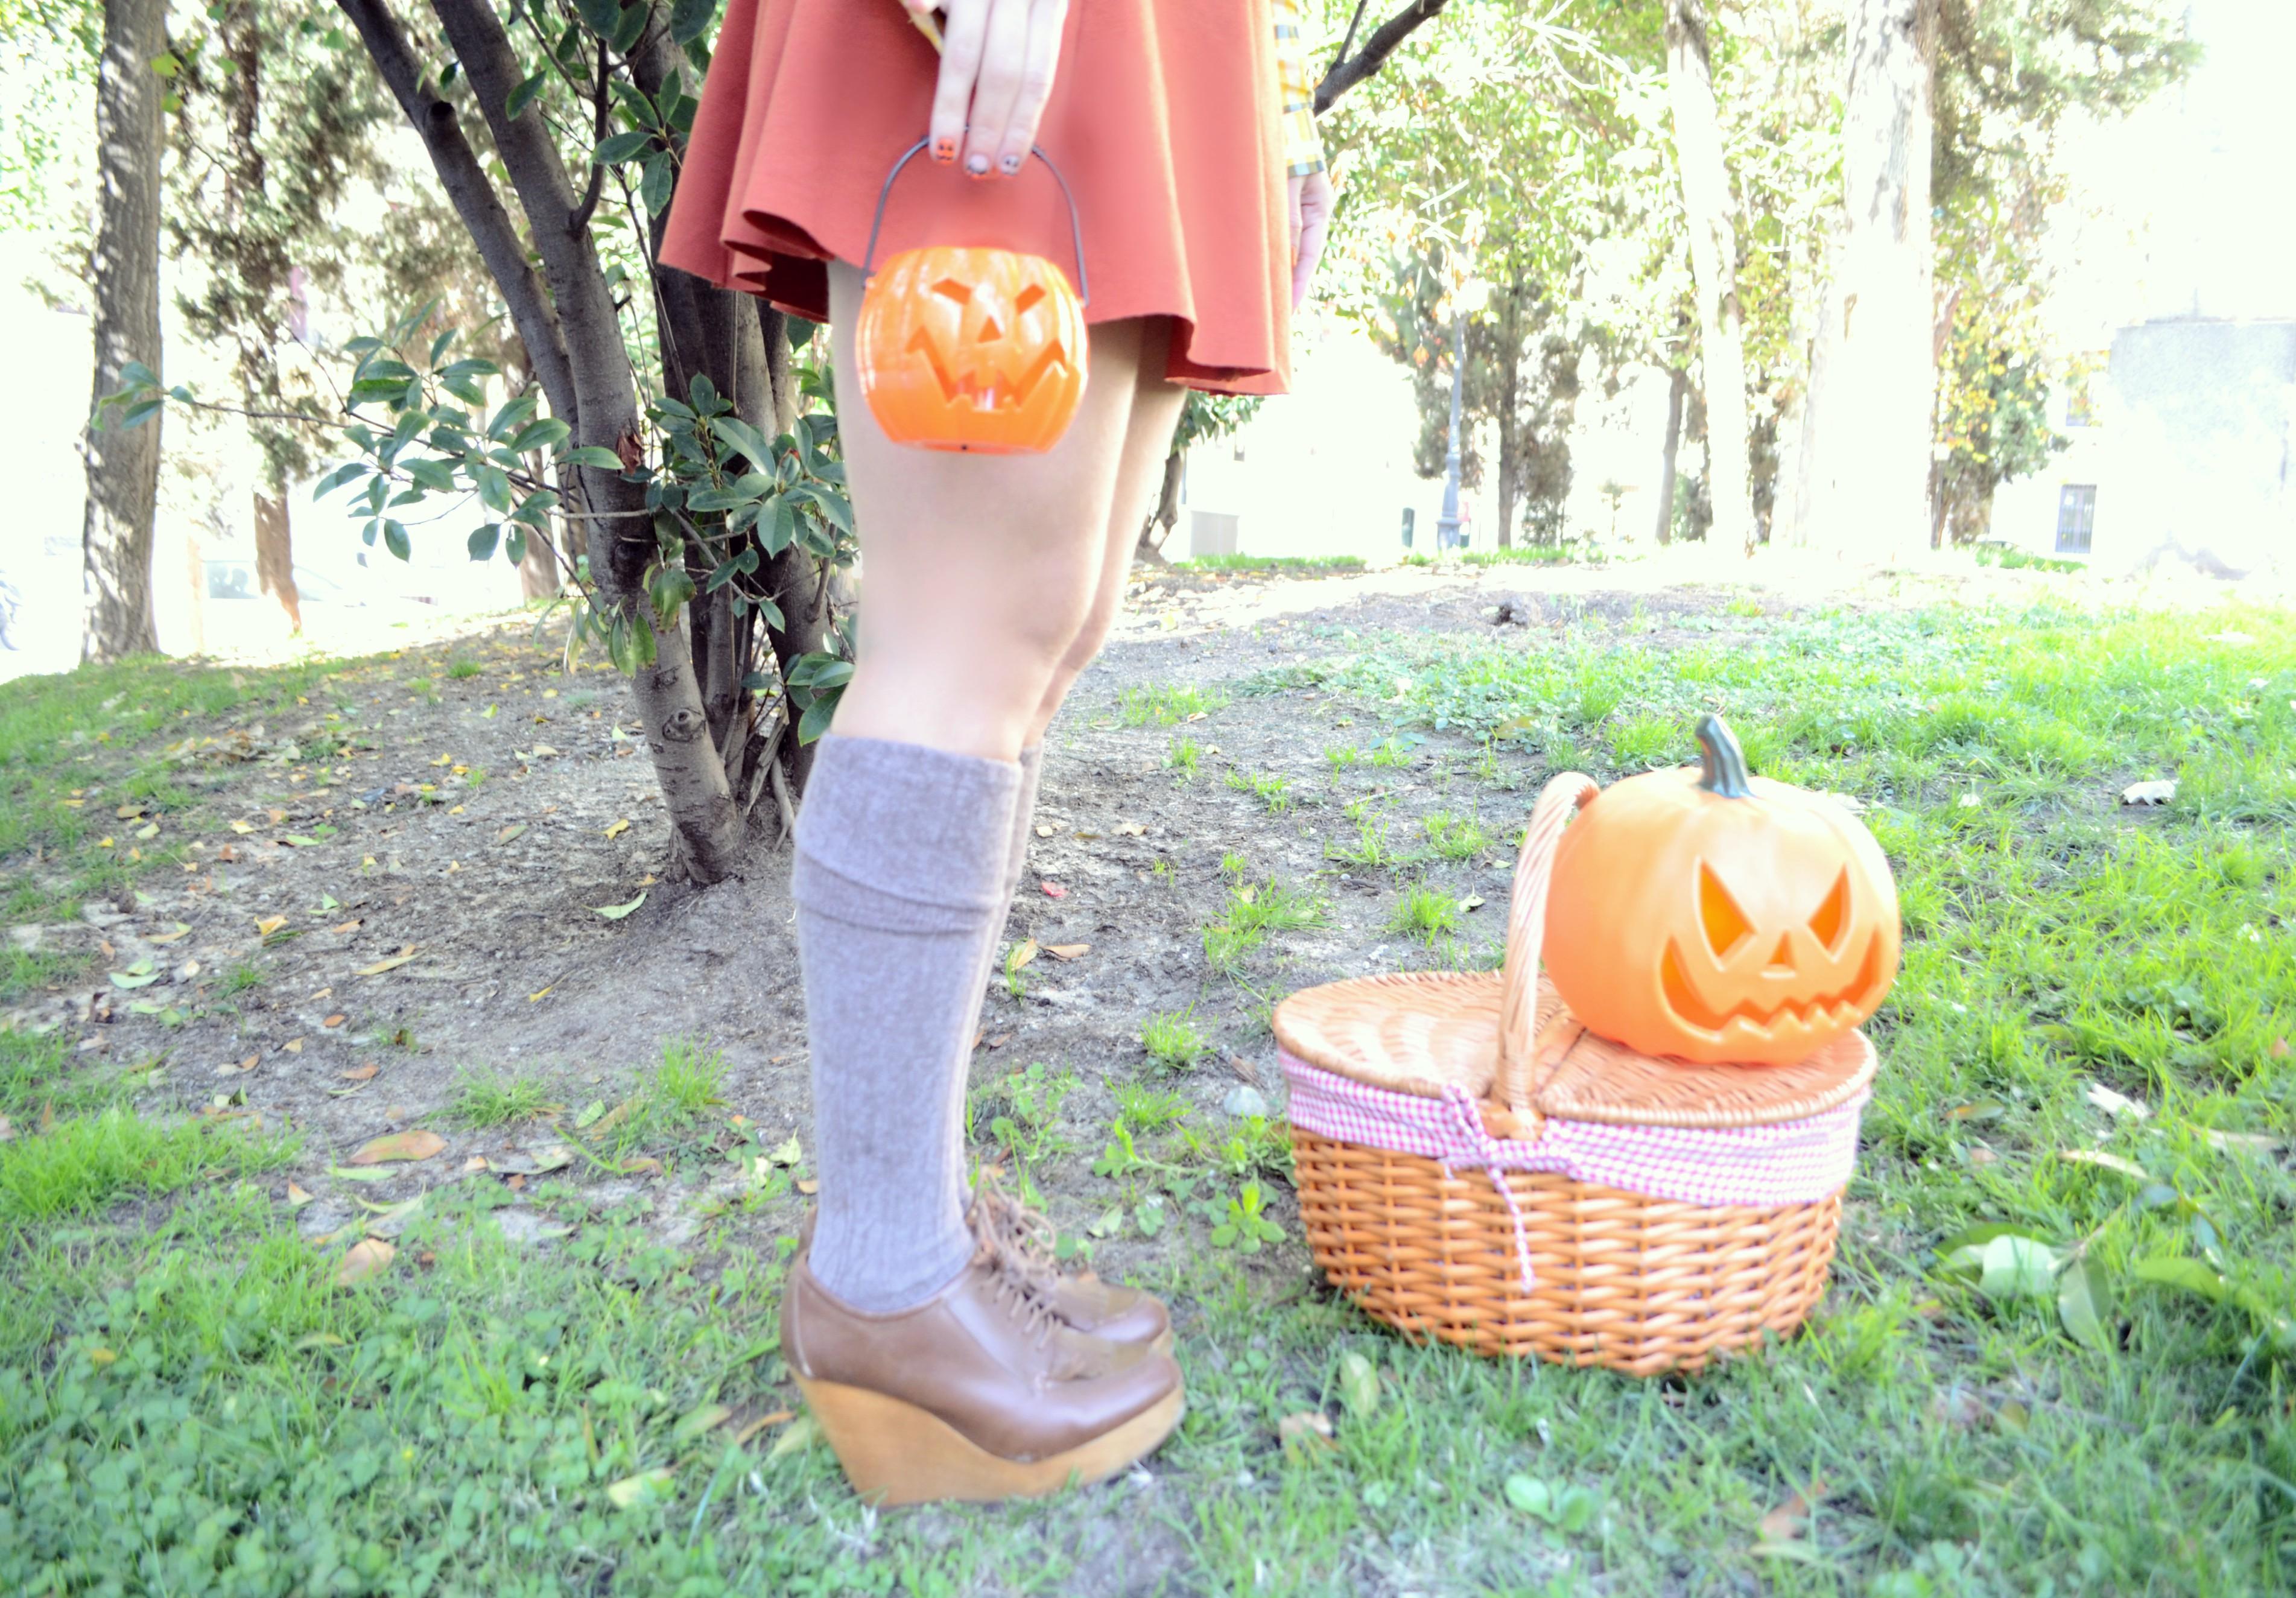 Disfraces-para-Halloween-ChicAdicta-blog-de-moda-Chic-Adicta-fashionista-nails-design-urvan-Madrid-PiensaenChic-Piensa-en-Chic